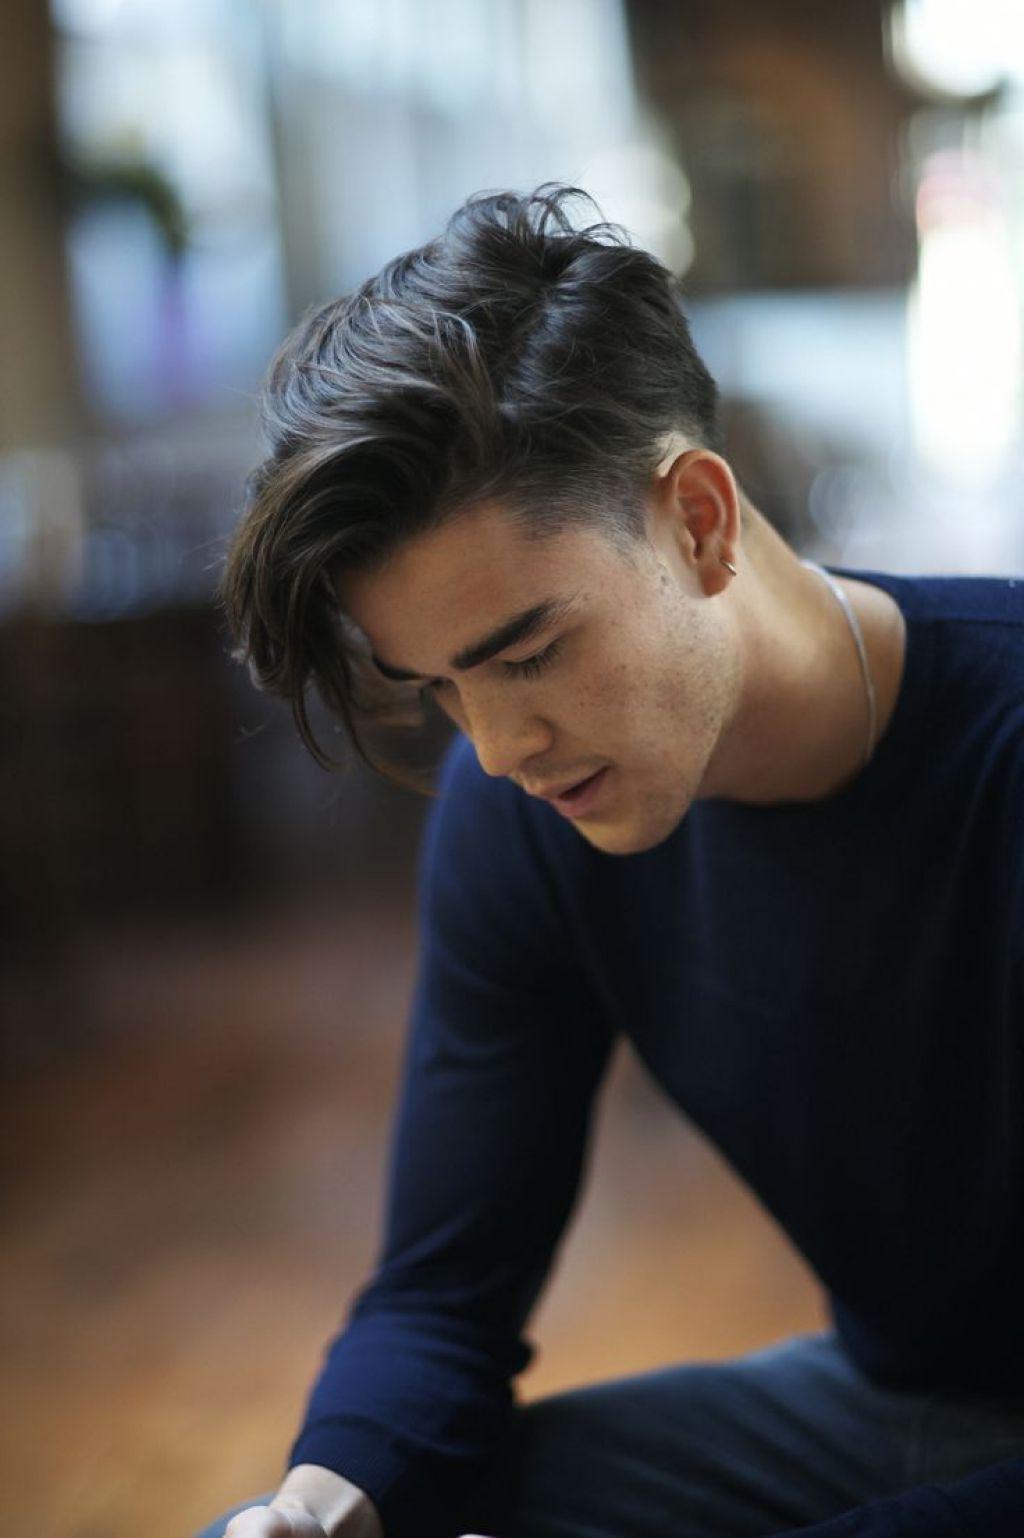 50 Statement Medium Hairstyles For Men Asian Men Hairstyle Hair Styles Boy Hairstyles